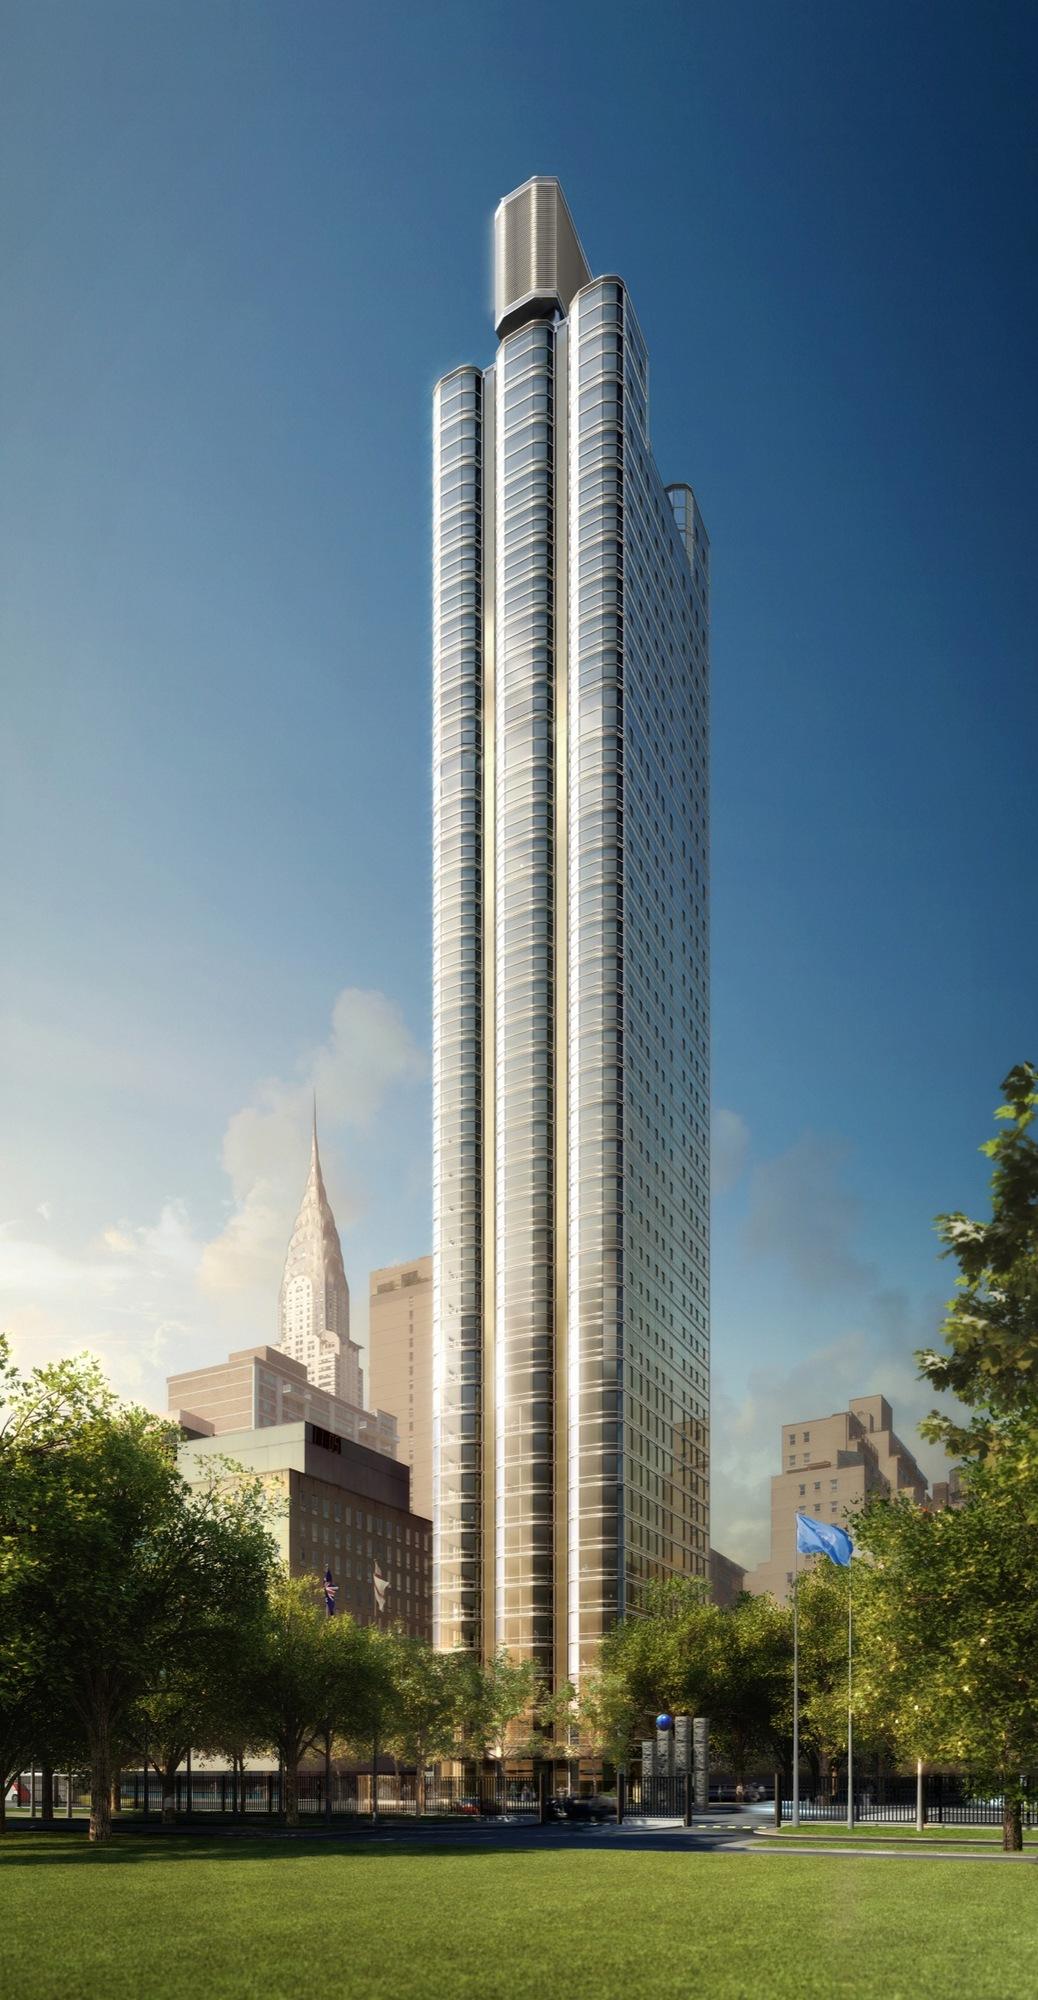 Primeiro edifício residencial de Foster+Partners nos EUA começa a ser construído